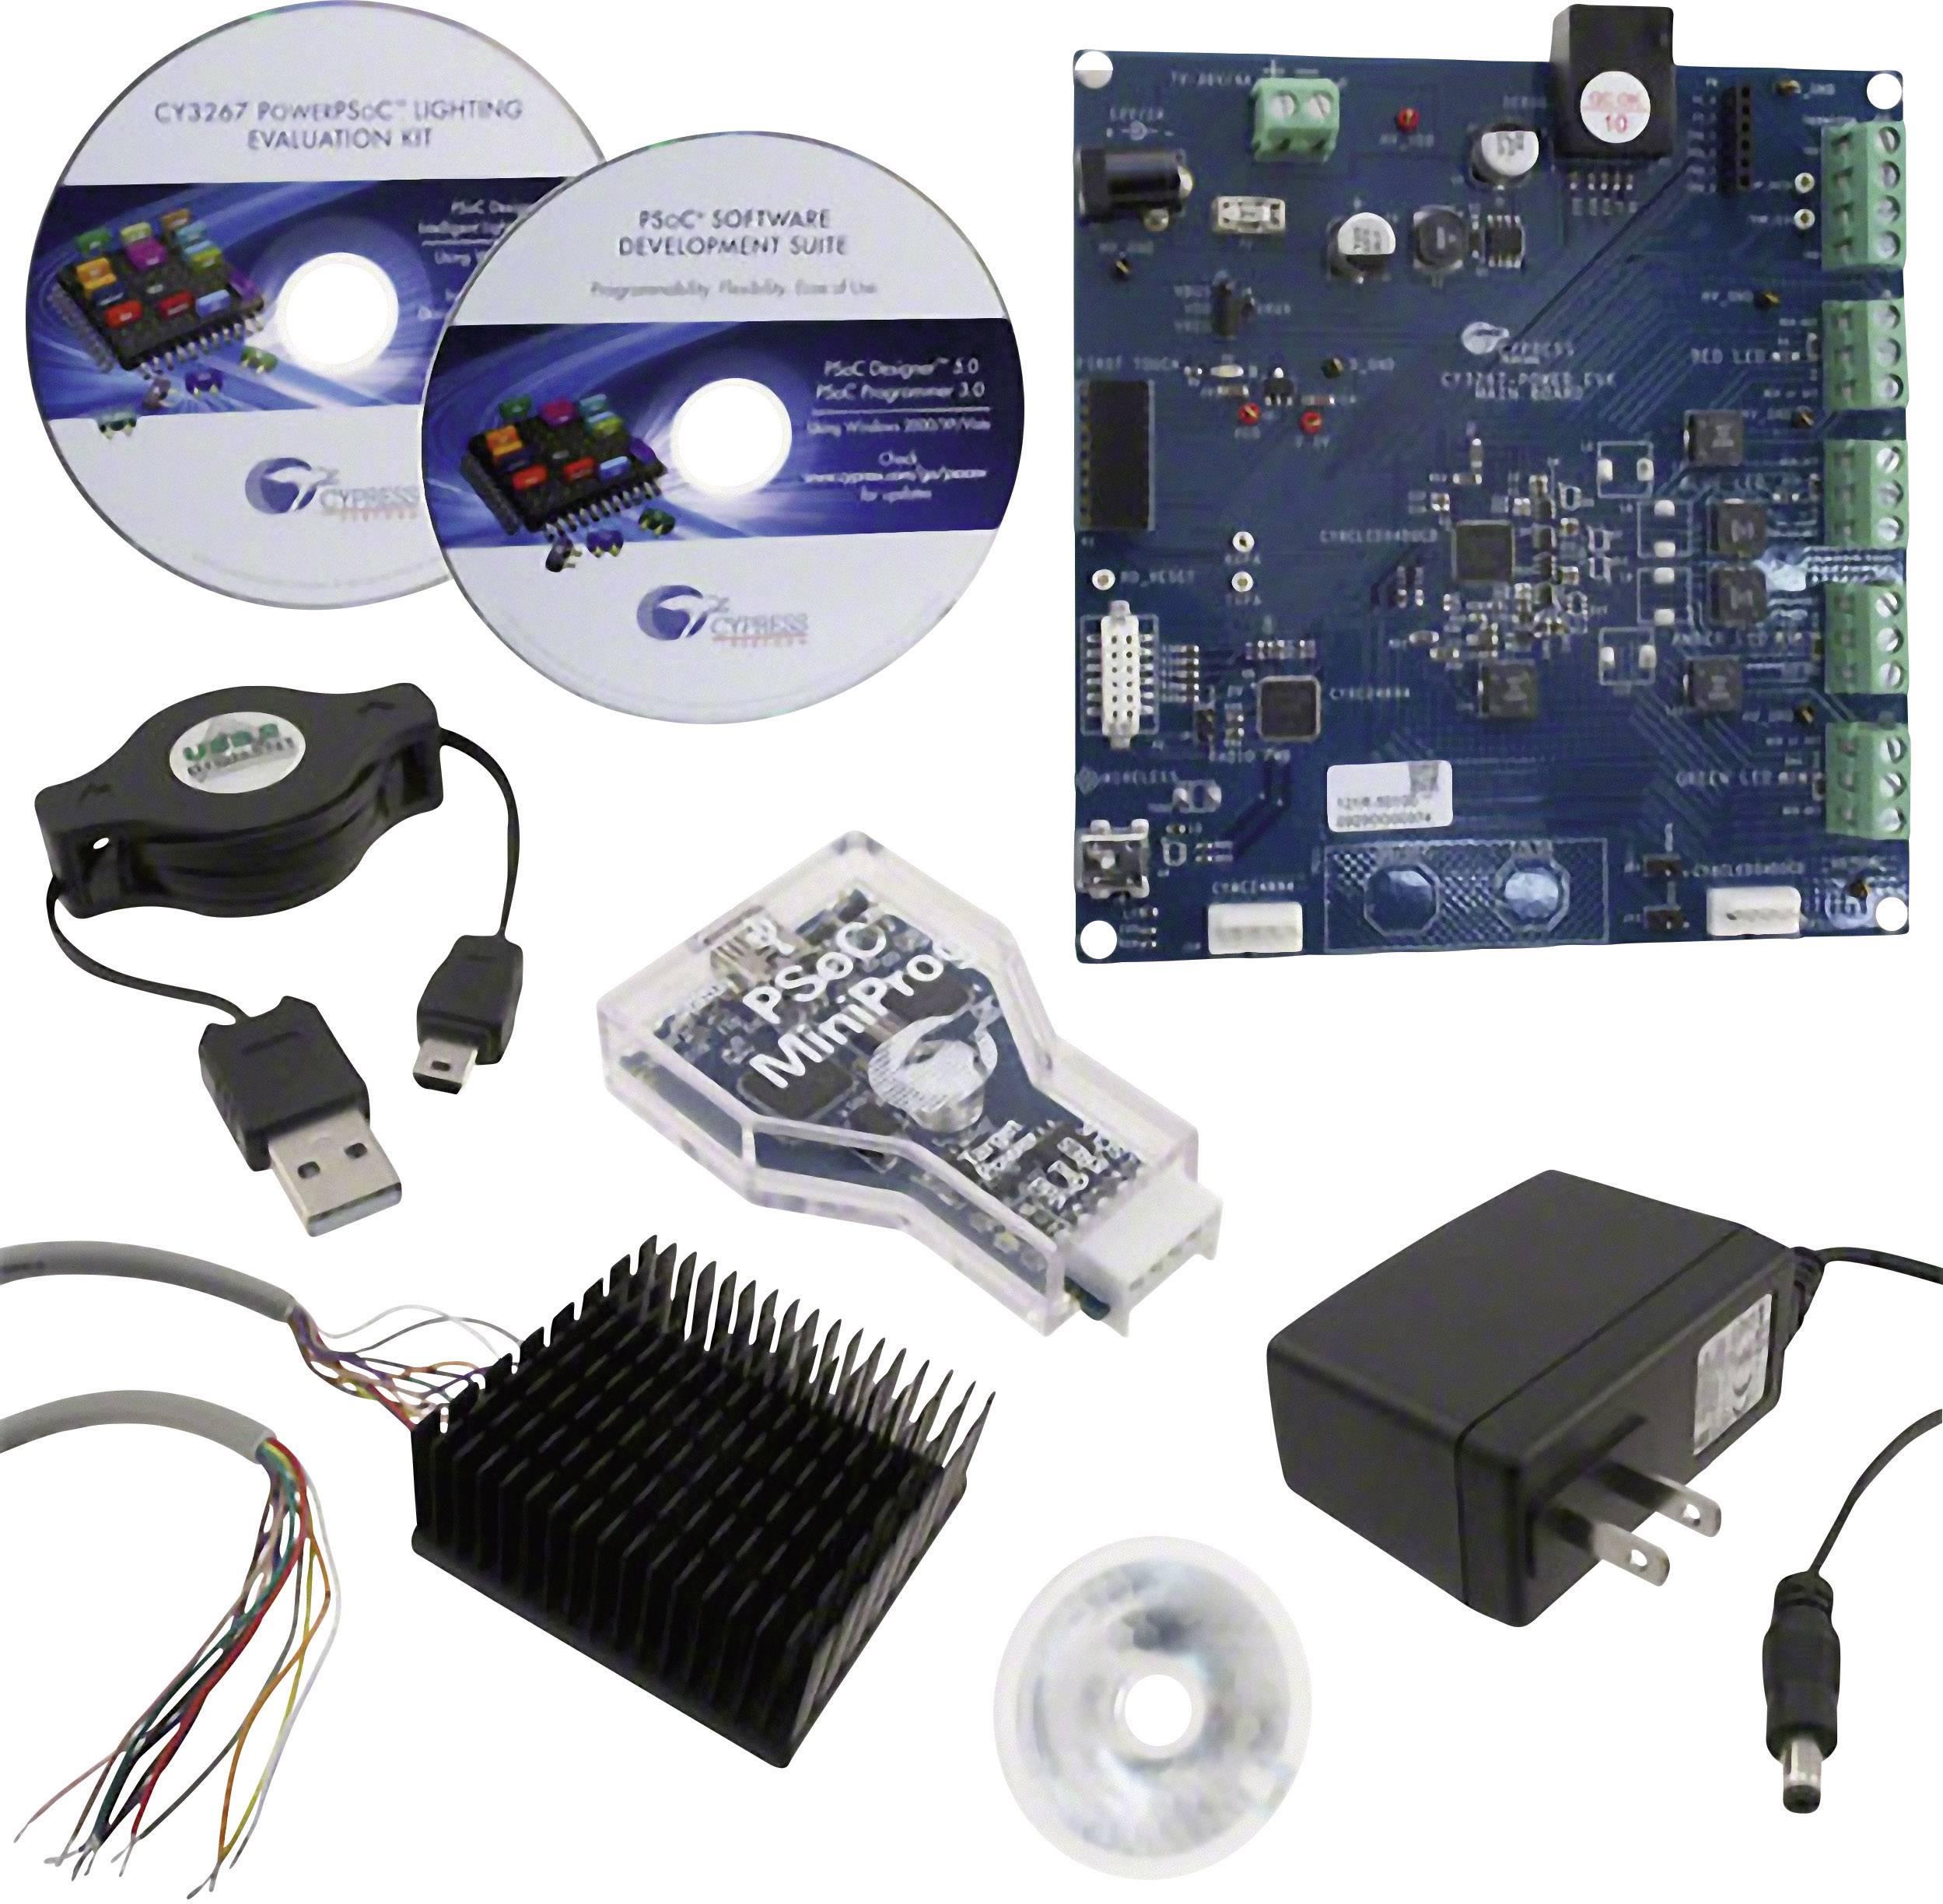 Vývojová deska Cypress Semiconductor CY3267